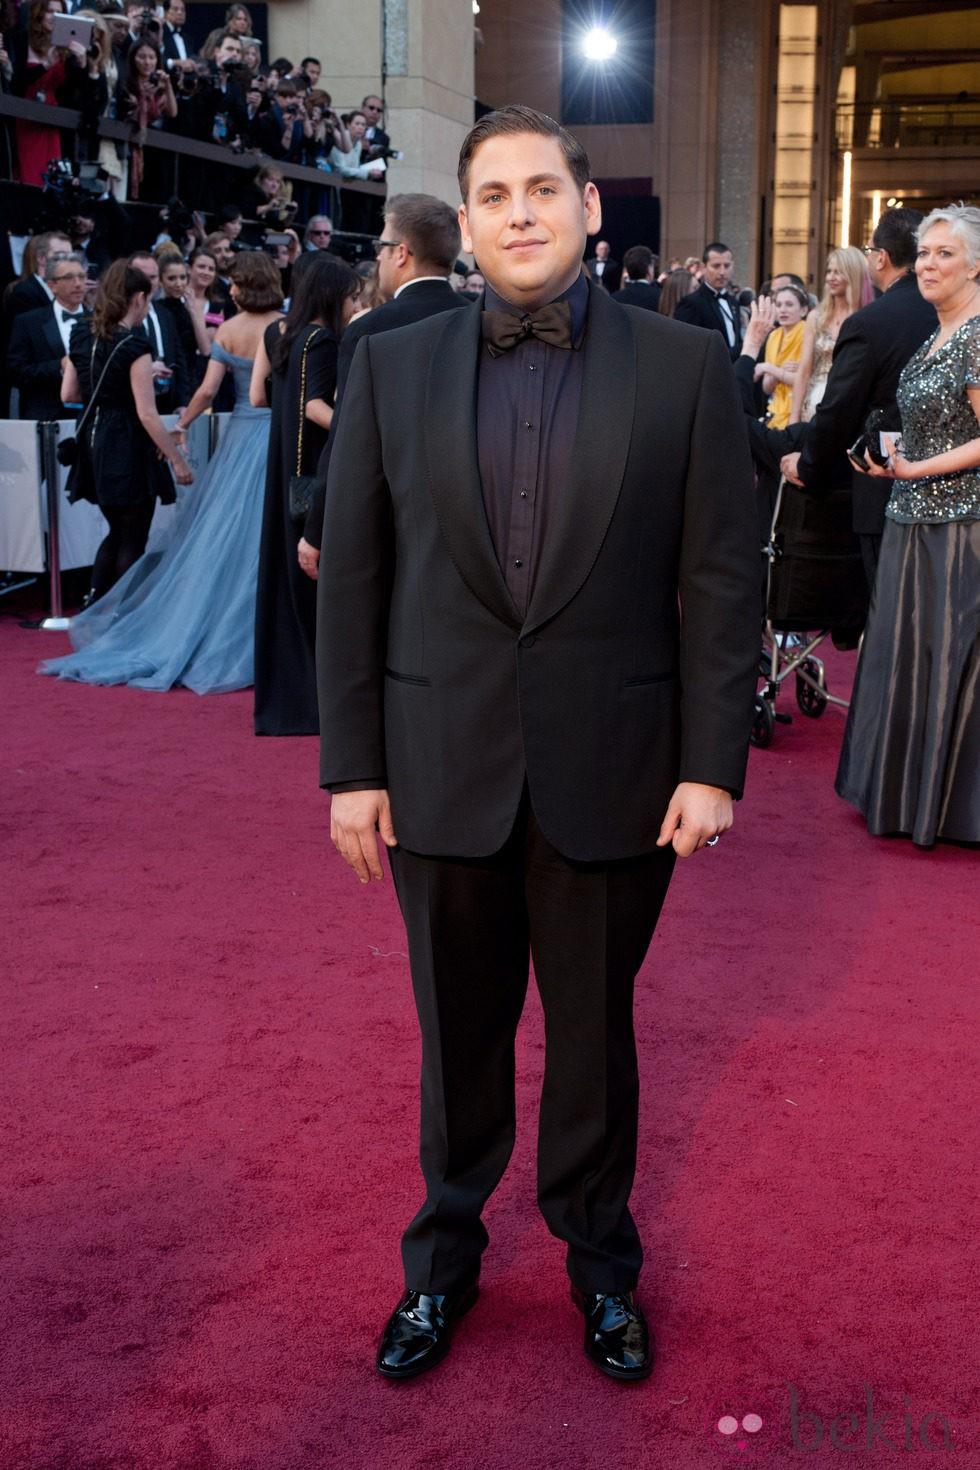 Jonah Hill en la alfombra roja de los Oscar 2012